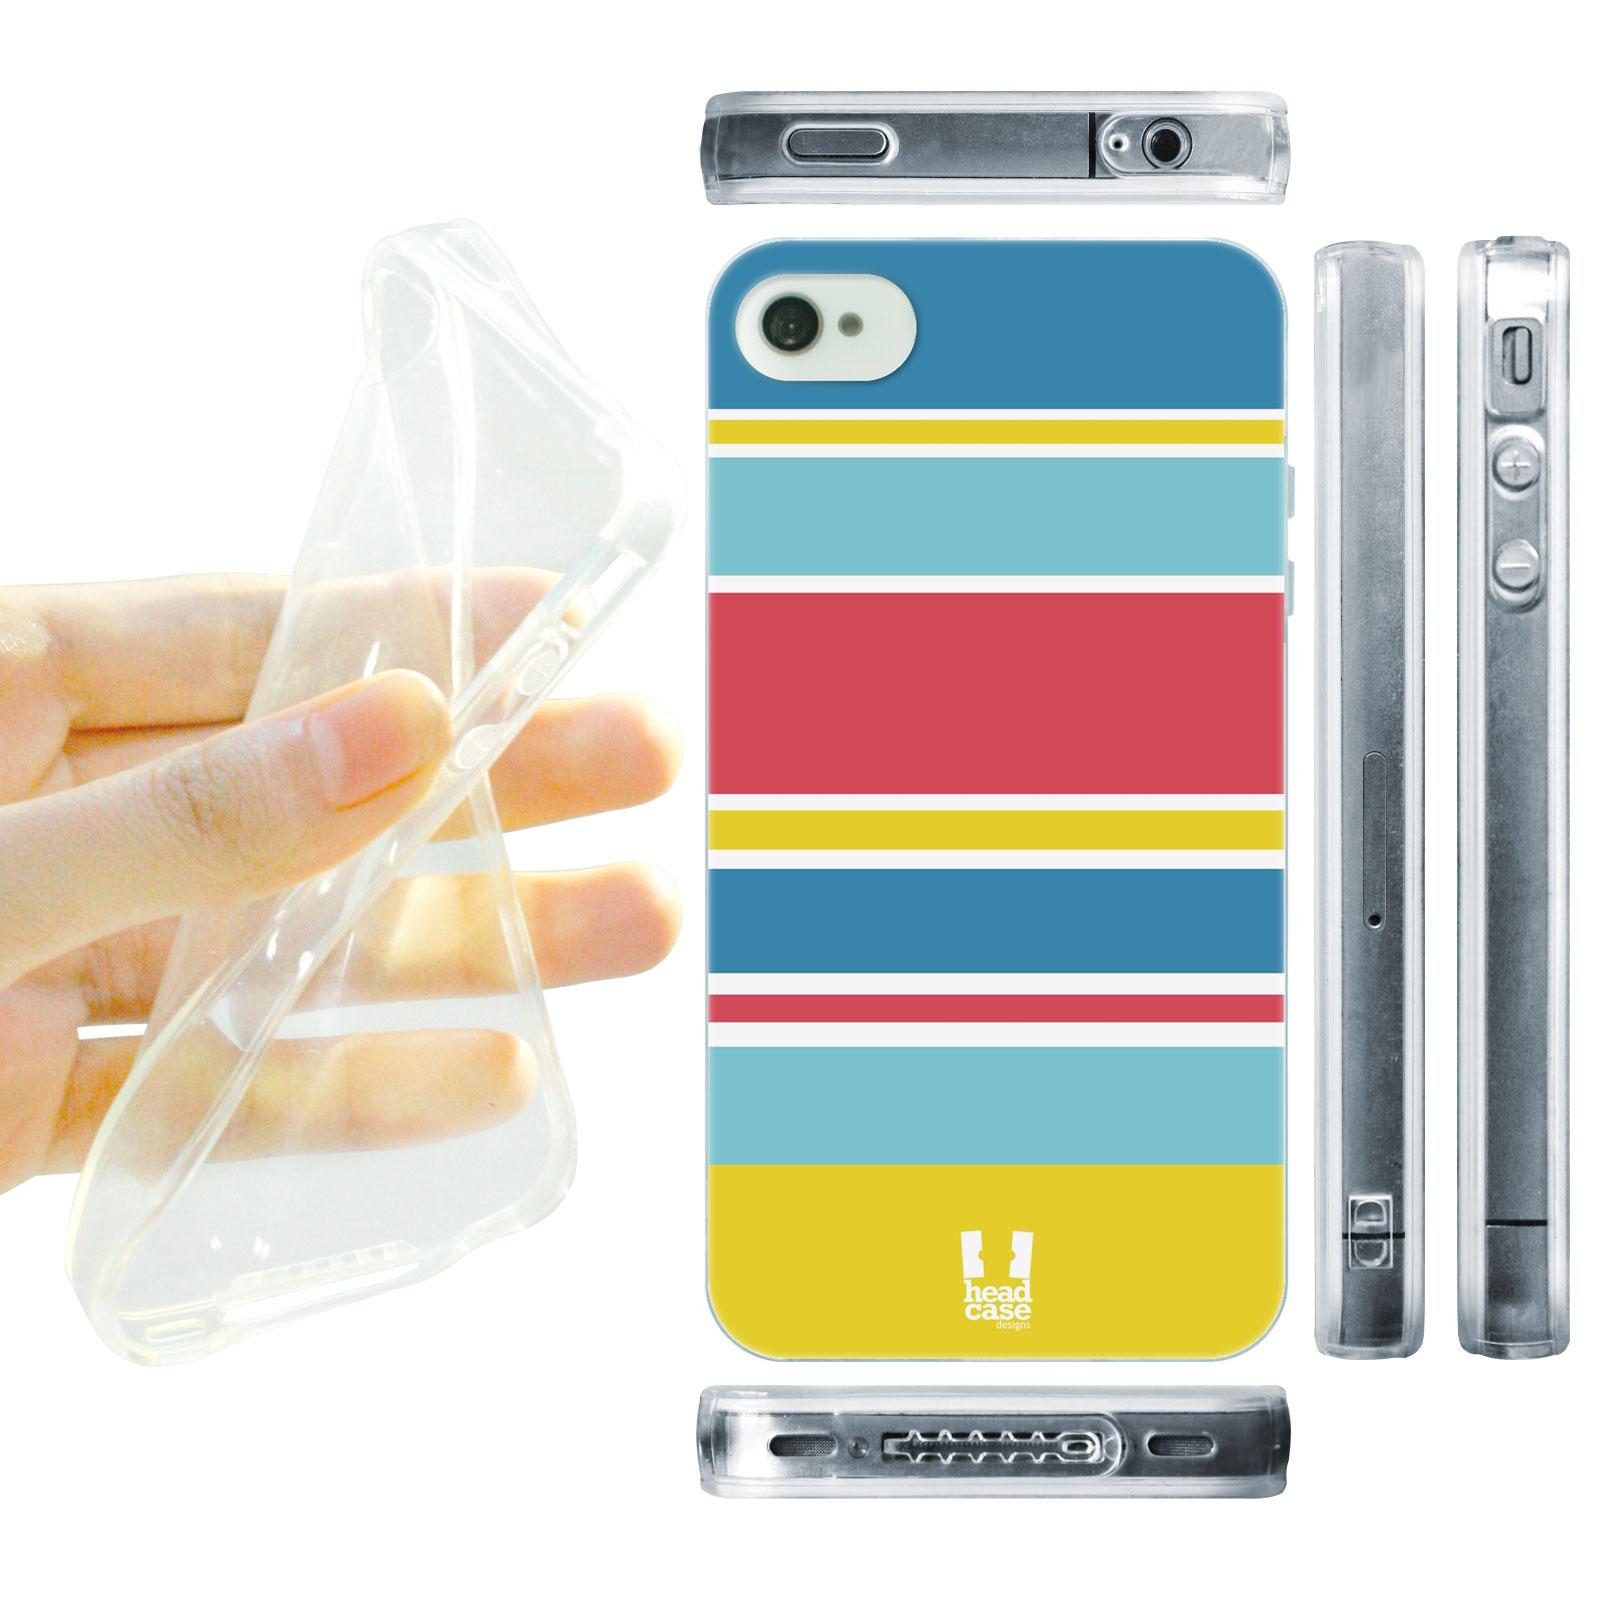 HEAD CASE silikonový obal na mobil Iphone 4/4S barevné pruhy modrá červená a žlutá